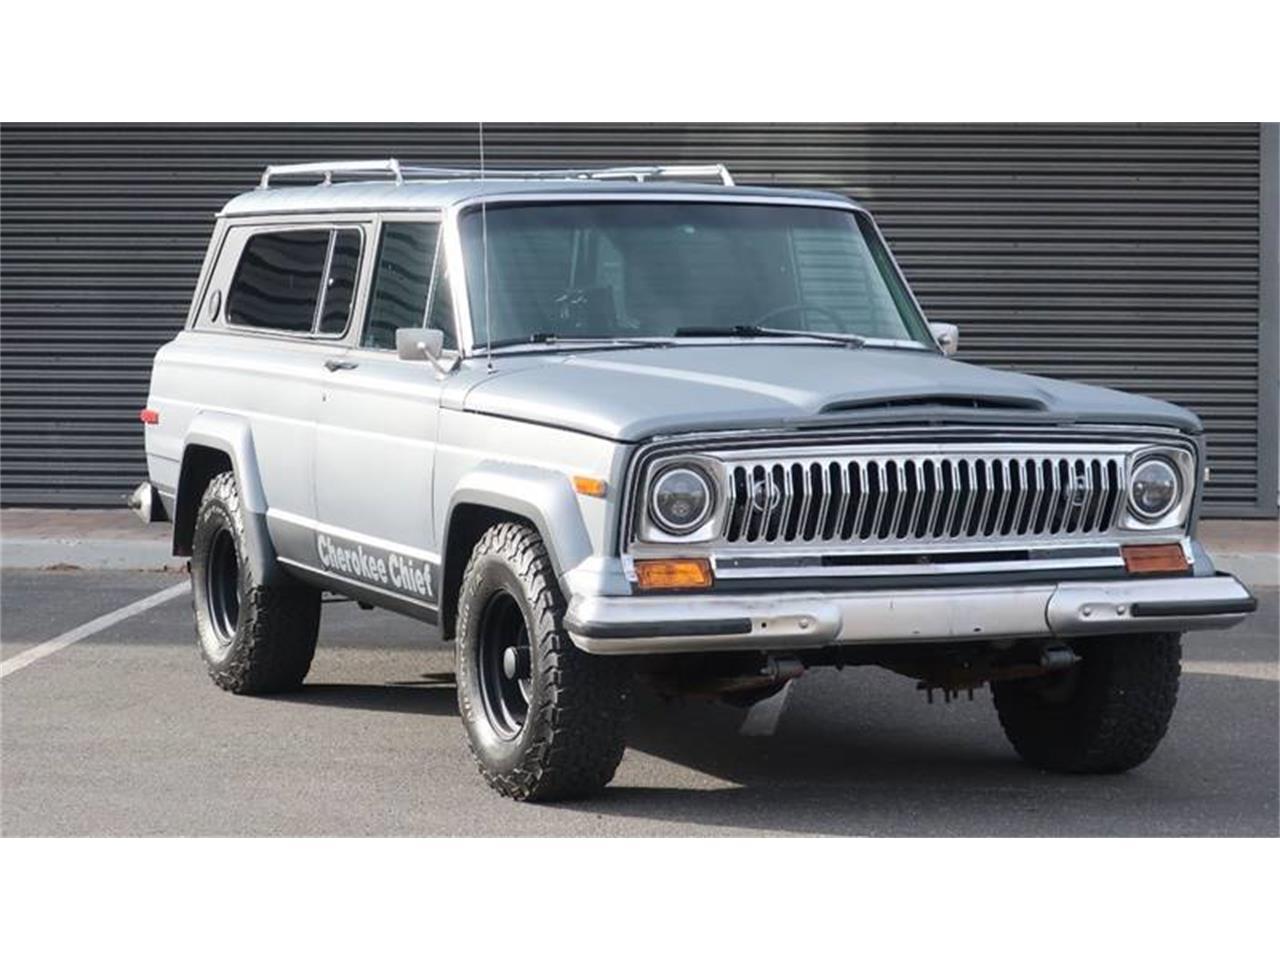 for sale 1976 jeep cherokee in hailey, idaho cars - hailey, id at geebo